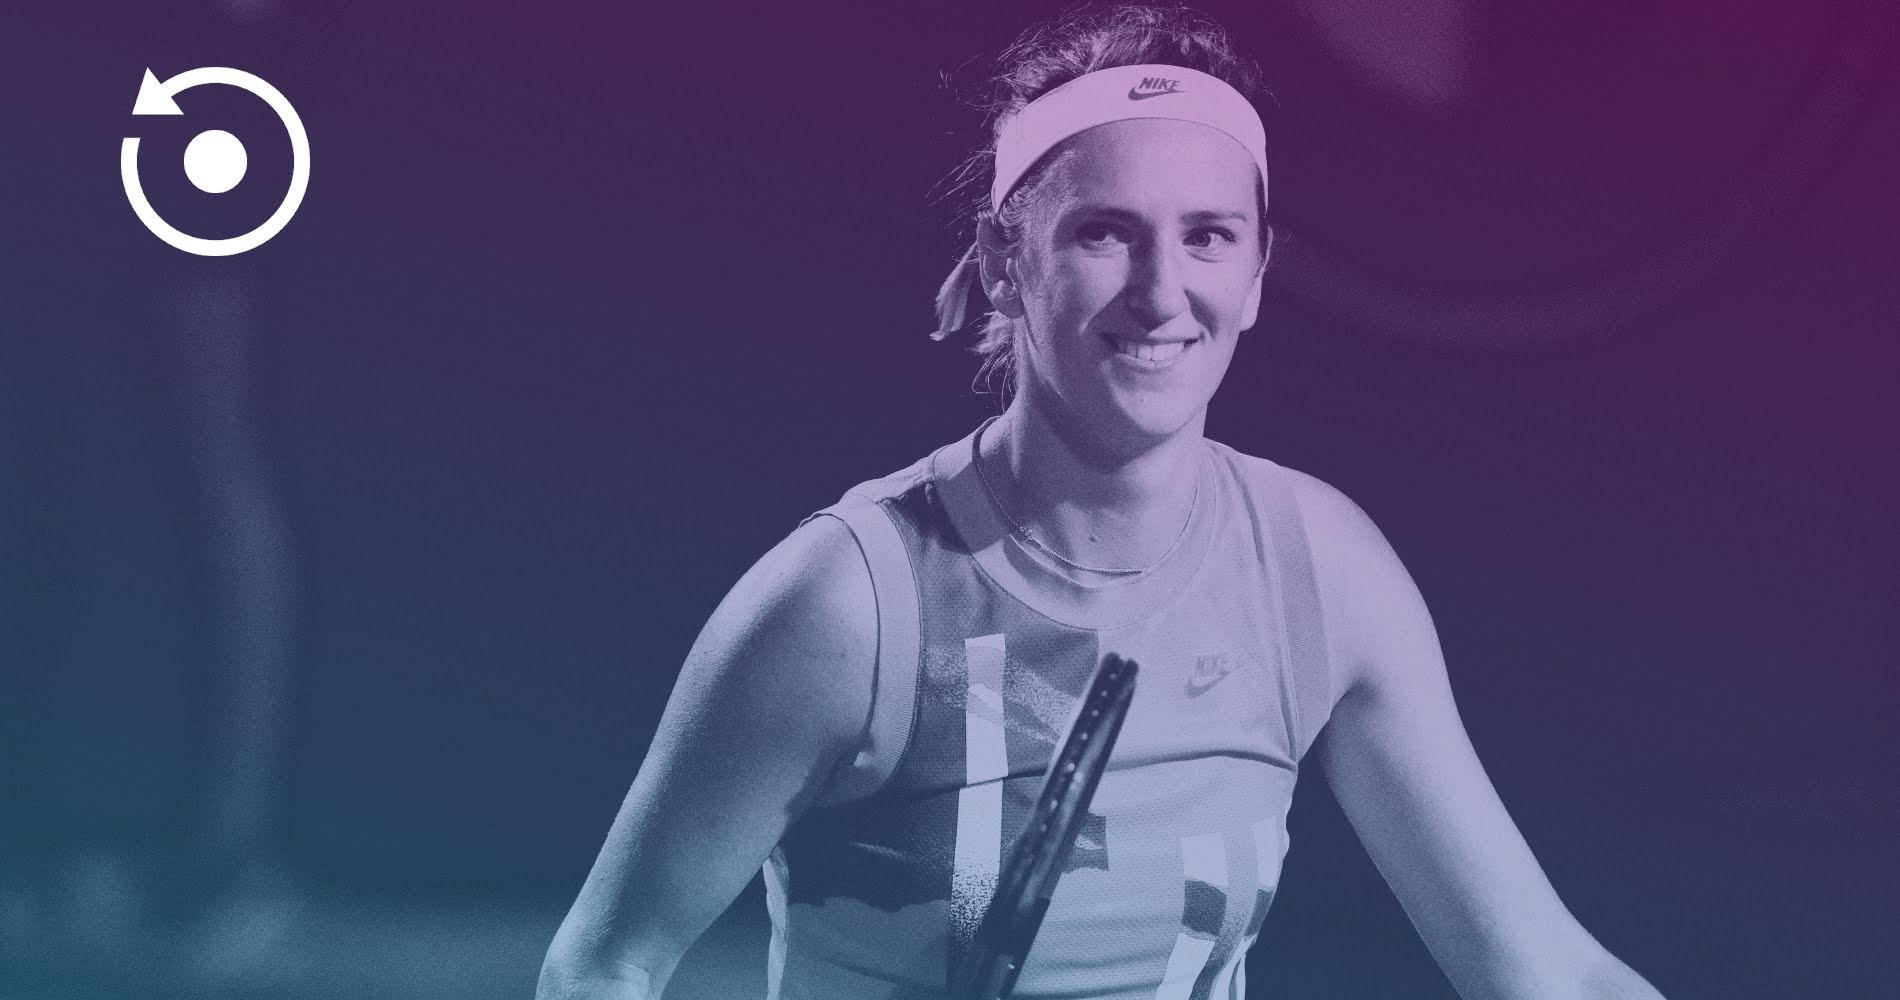 Victoria Azarenka, 2020 review